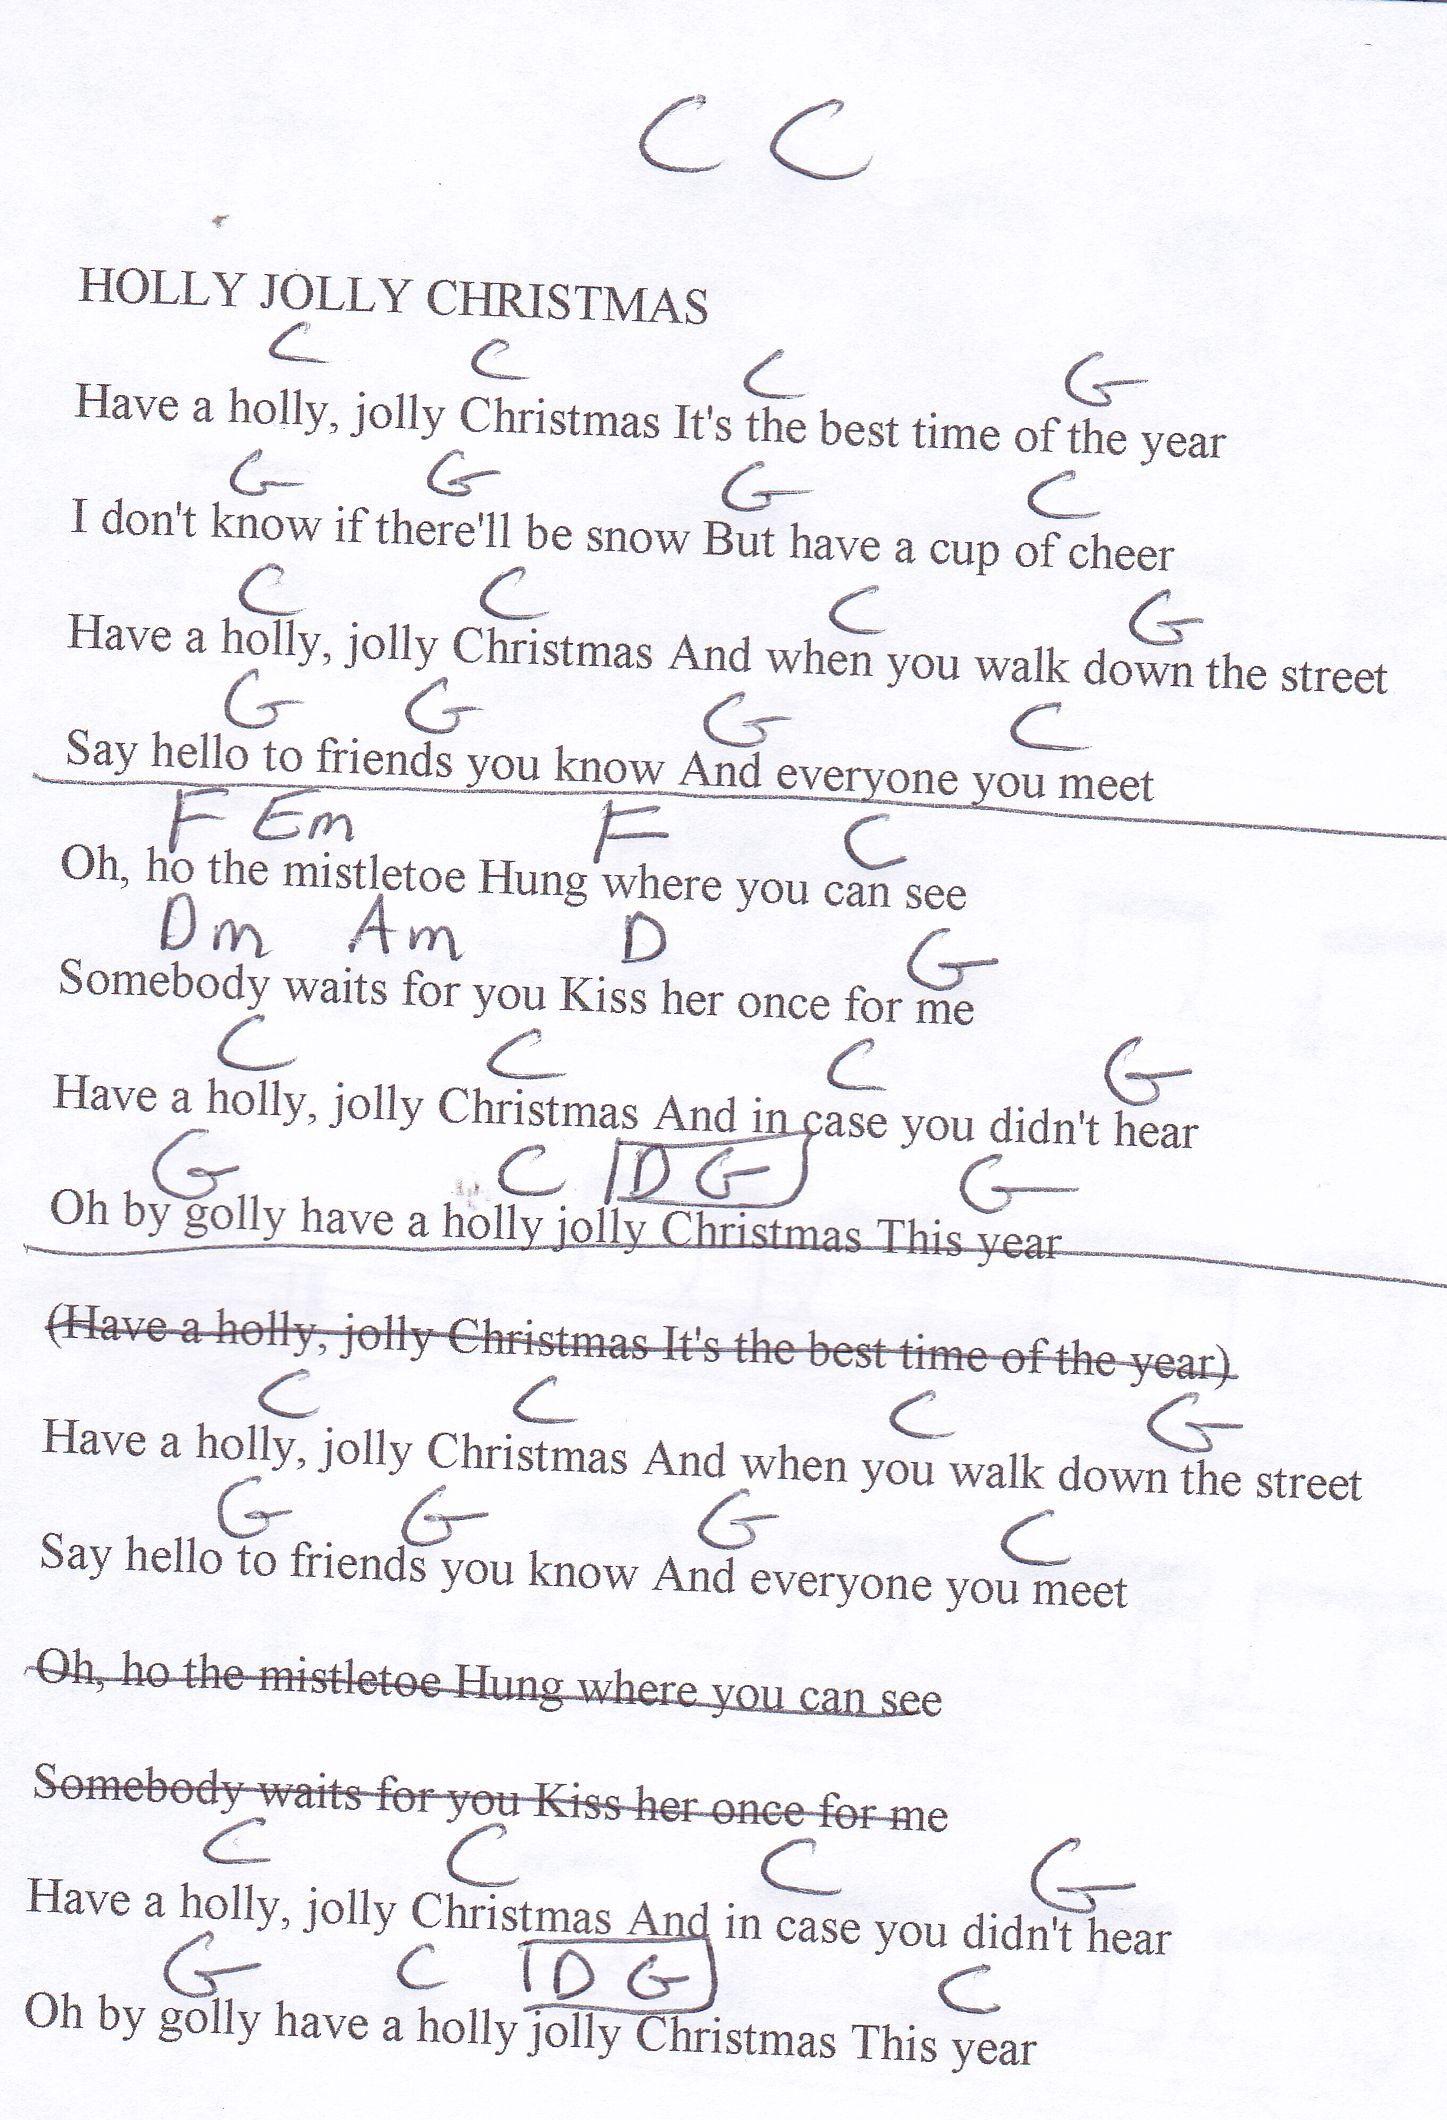 Holly Jolly Christmas - Guitar Chord Chart in C Major